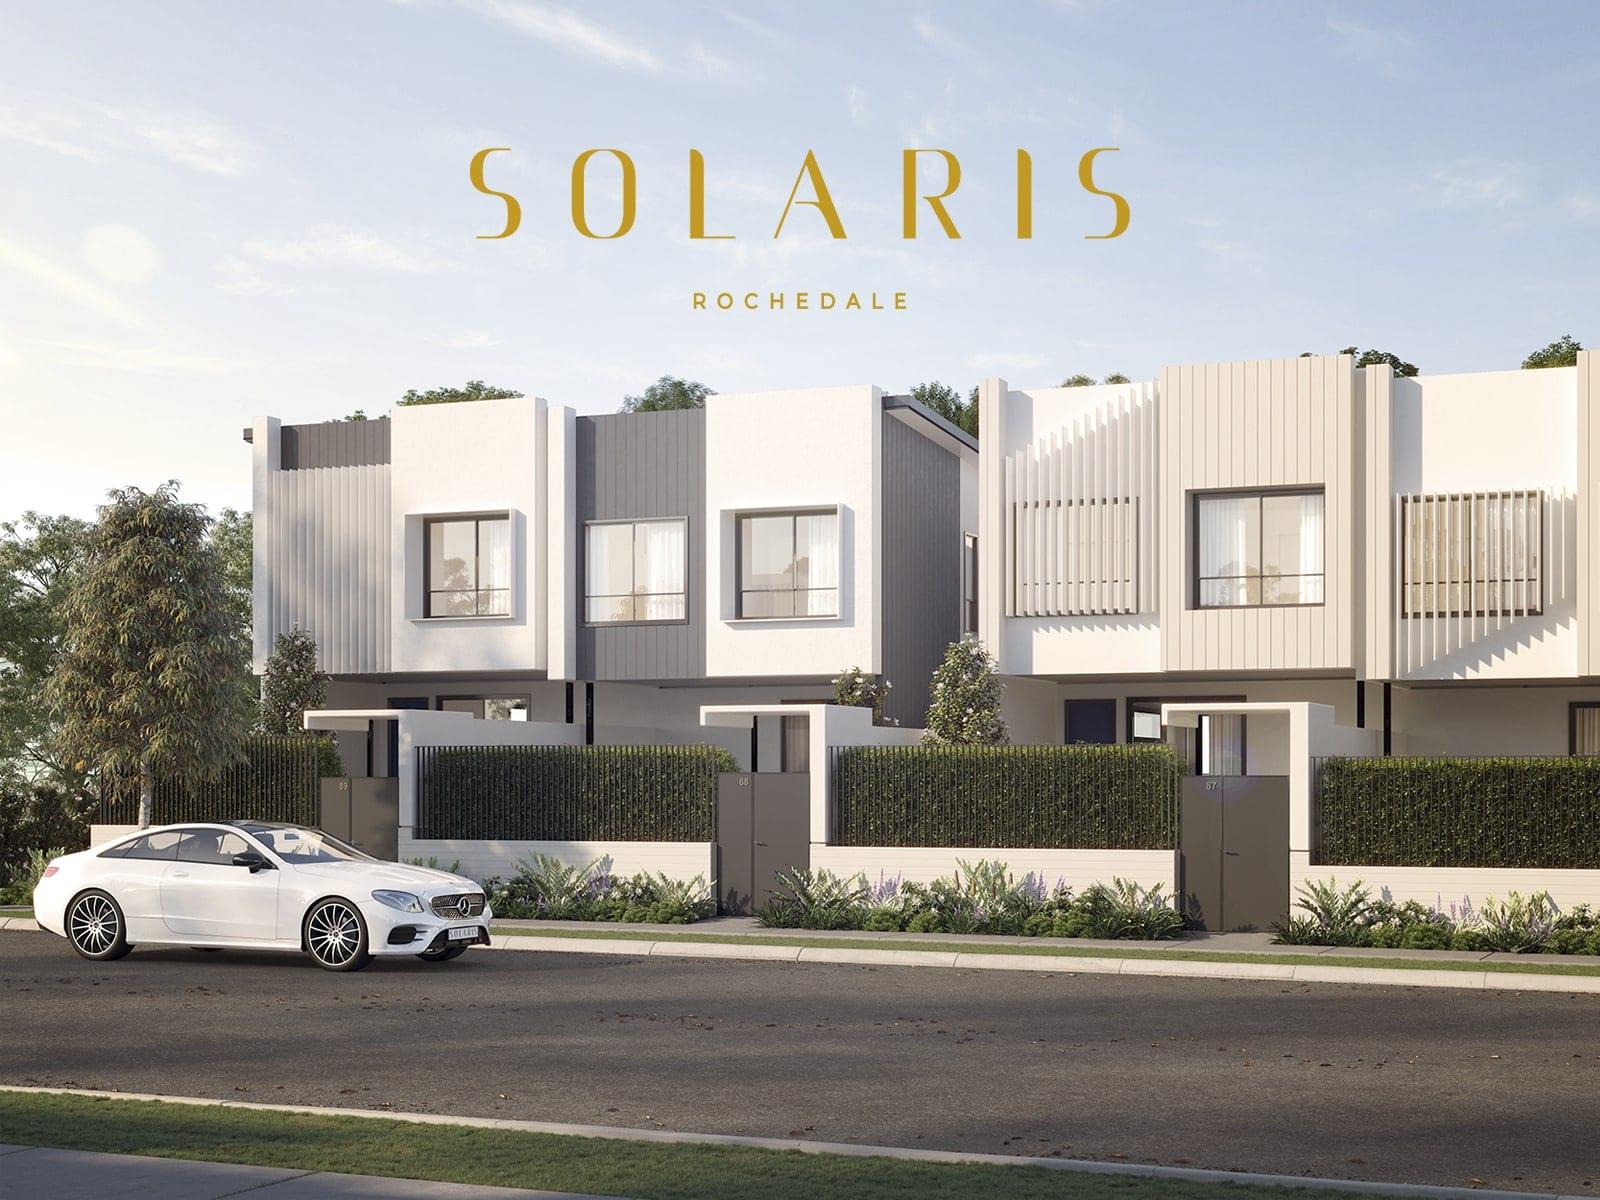 Solaris Rochedale